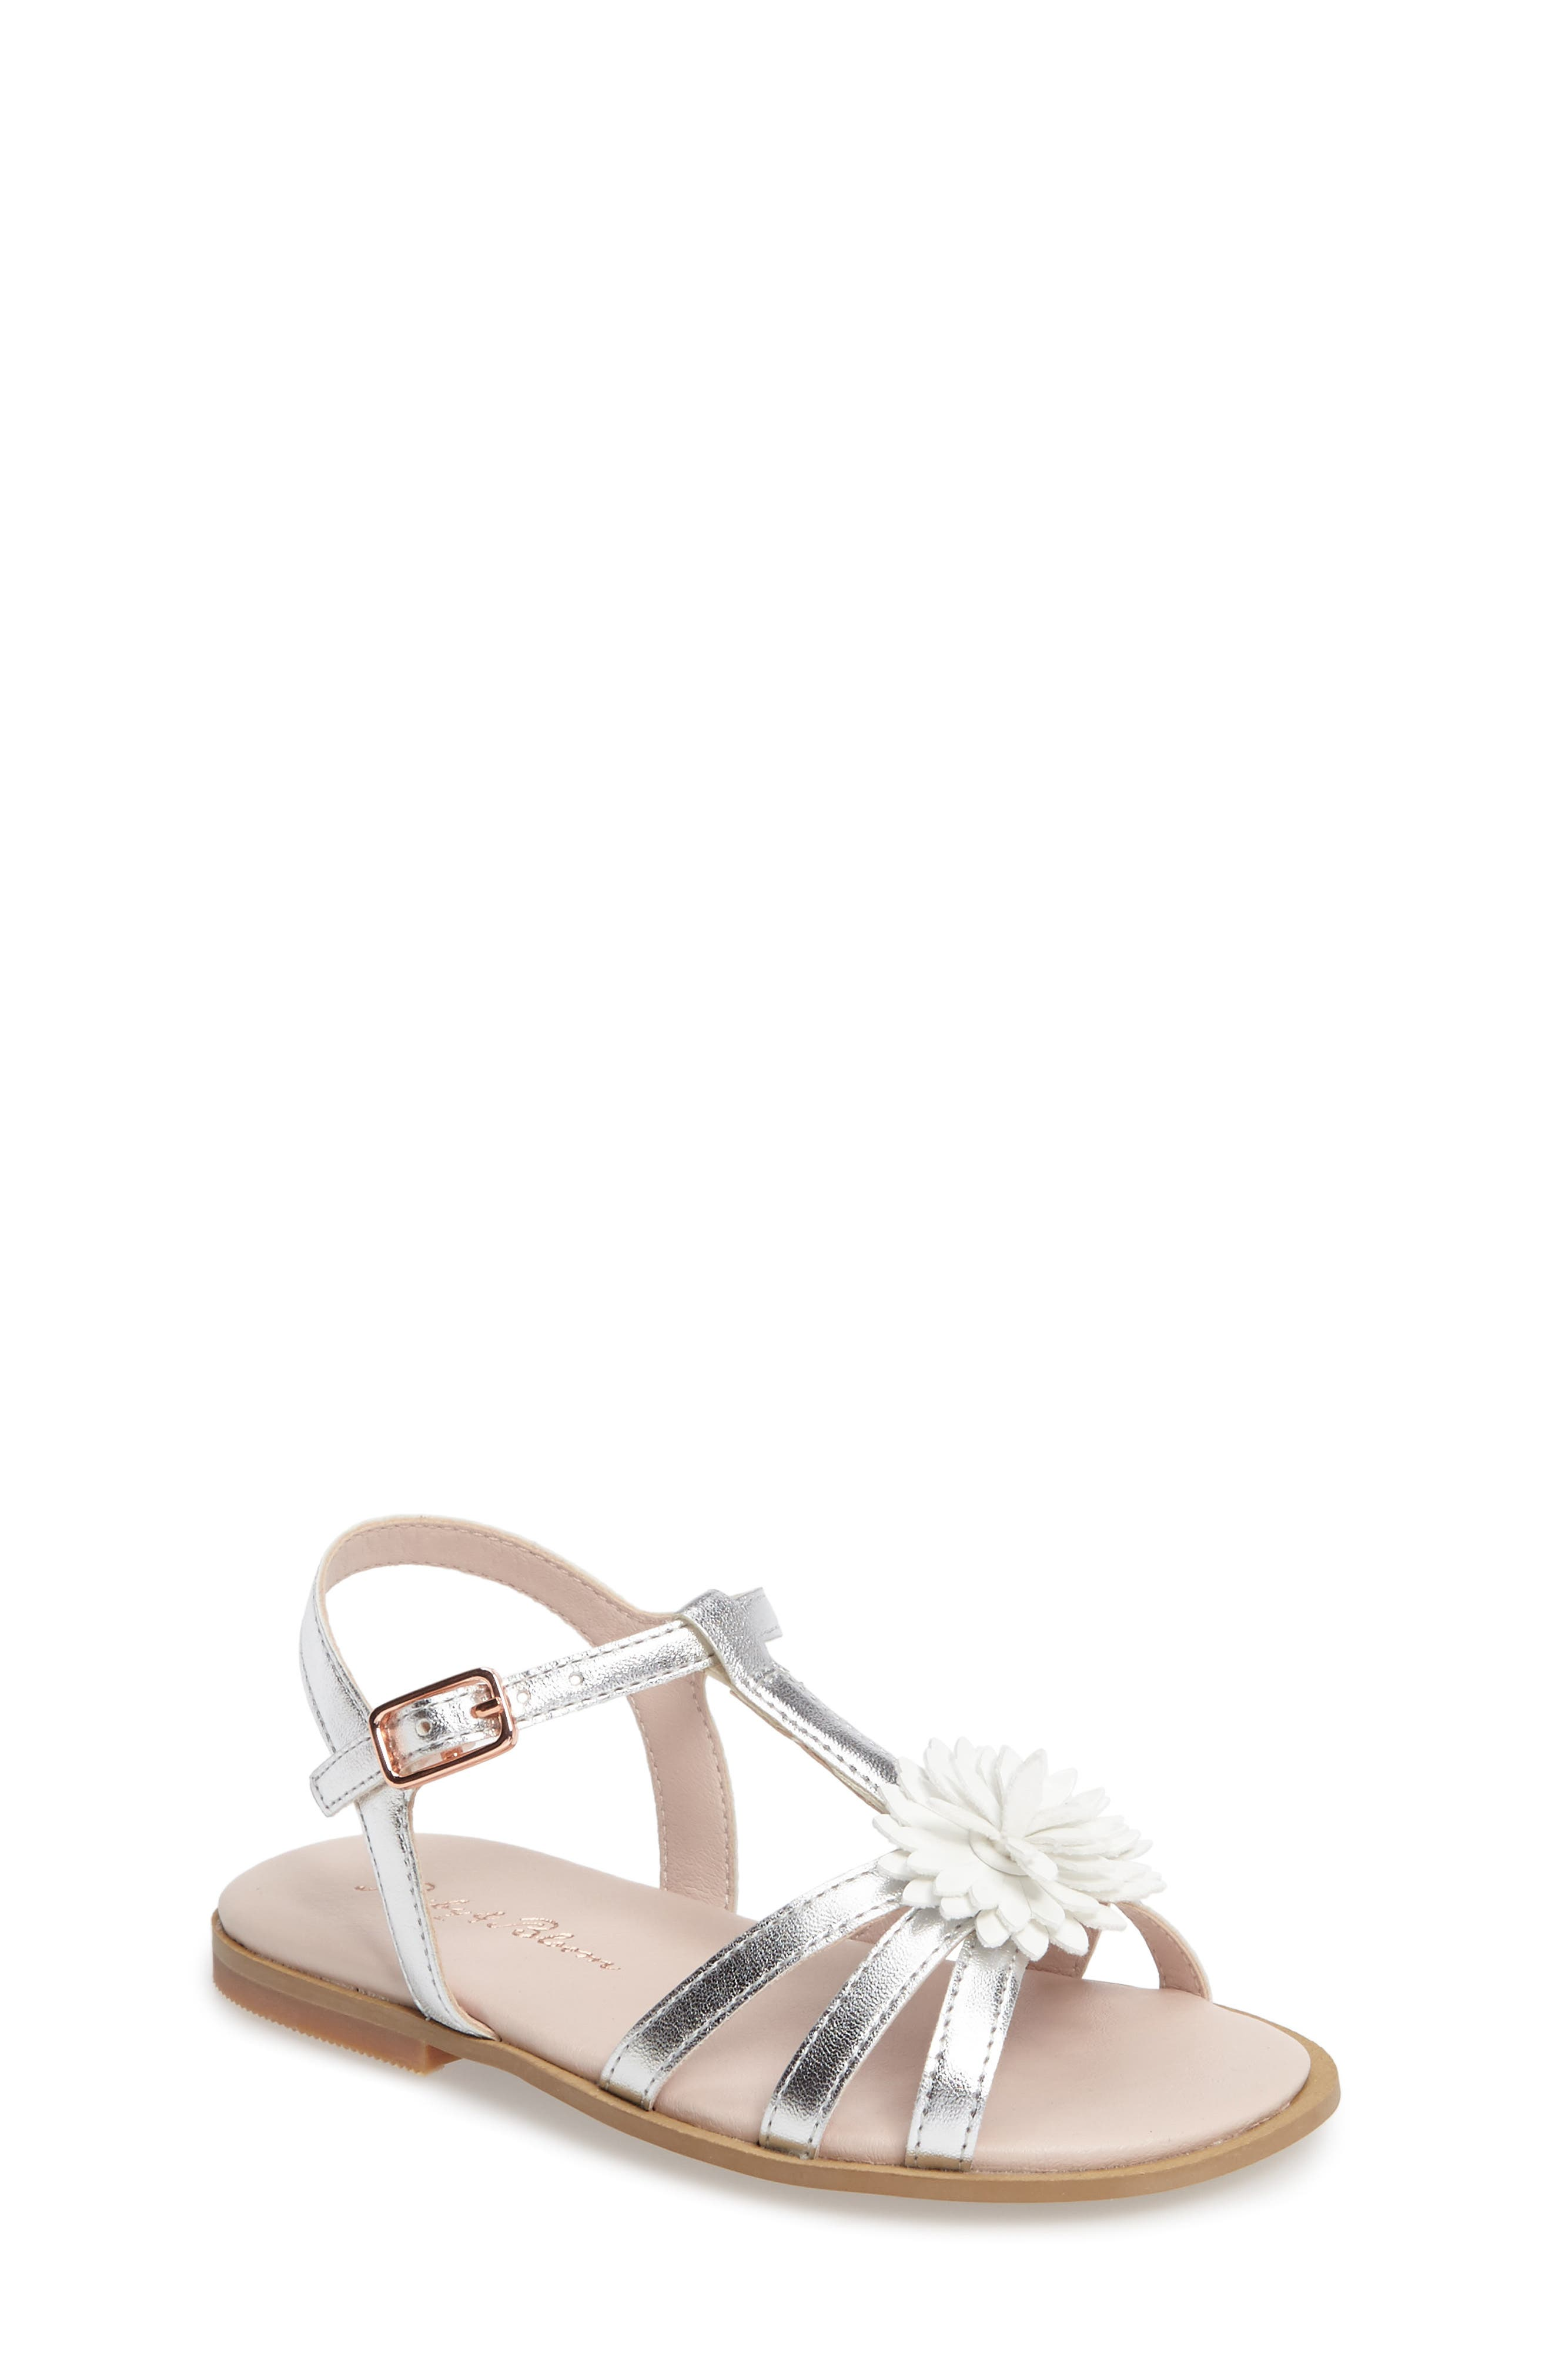 Ruby & Bloom Eloisa T-Strap Sandal (Walker & Toddler)